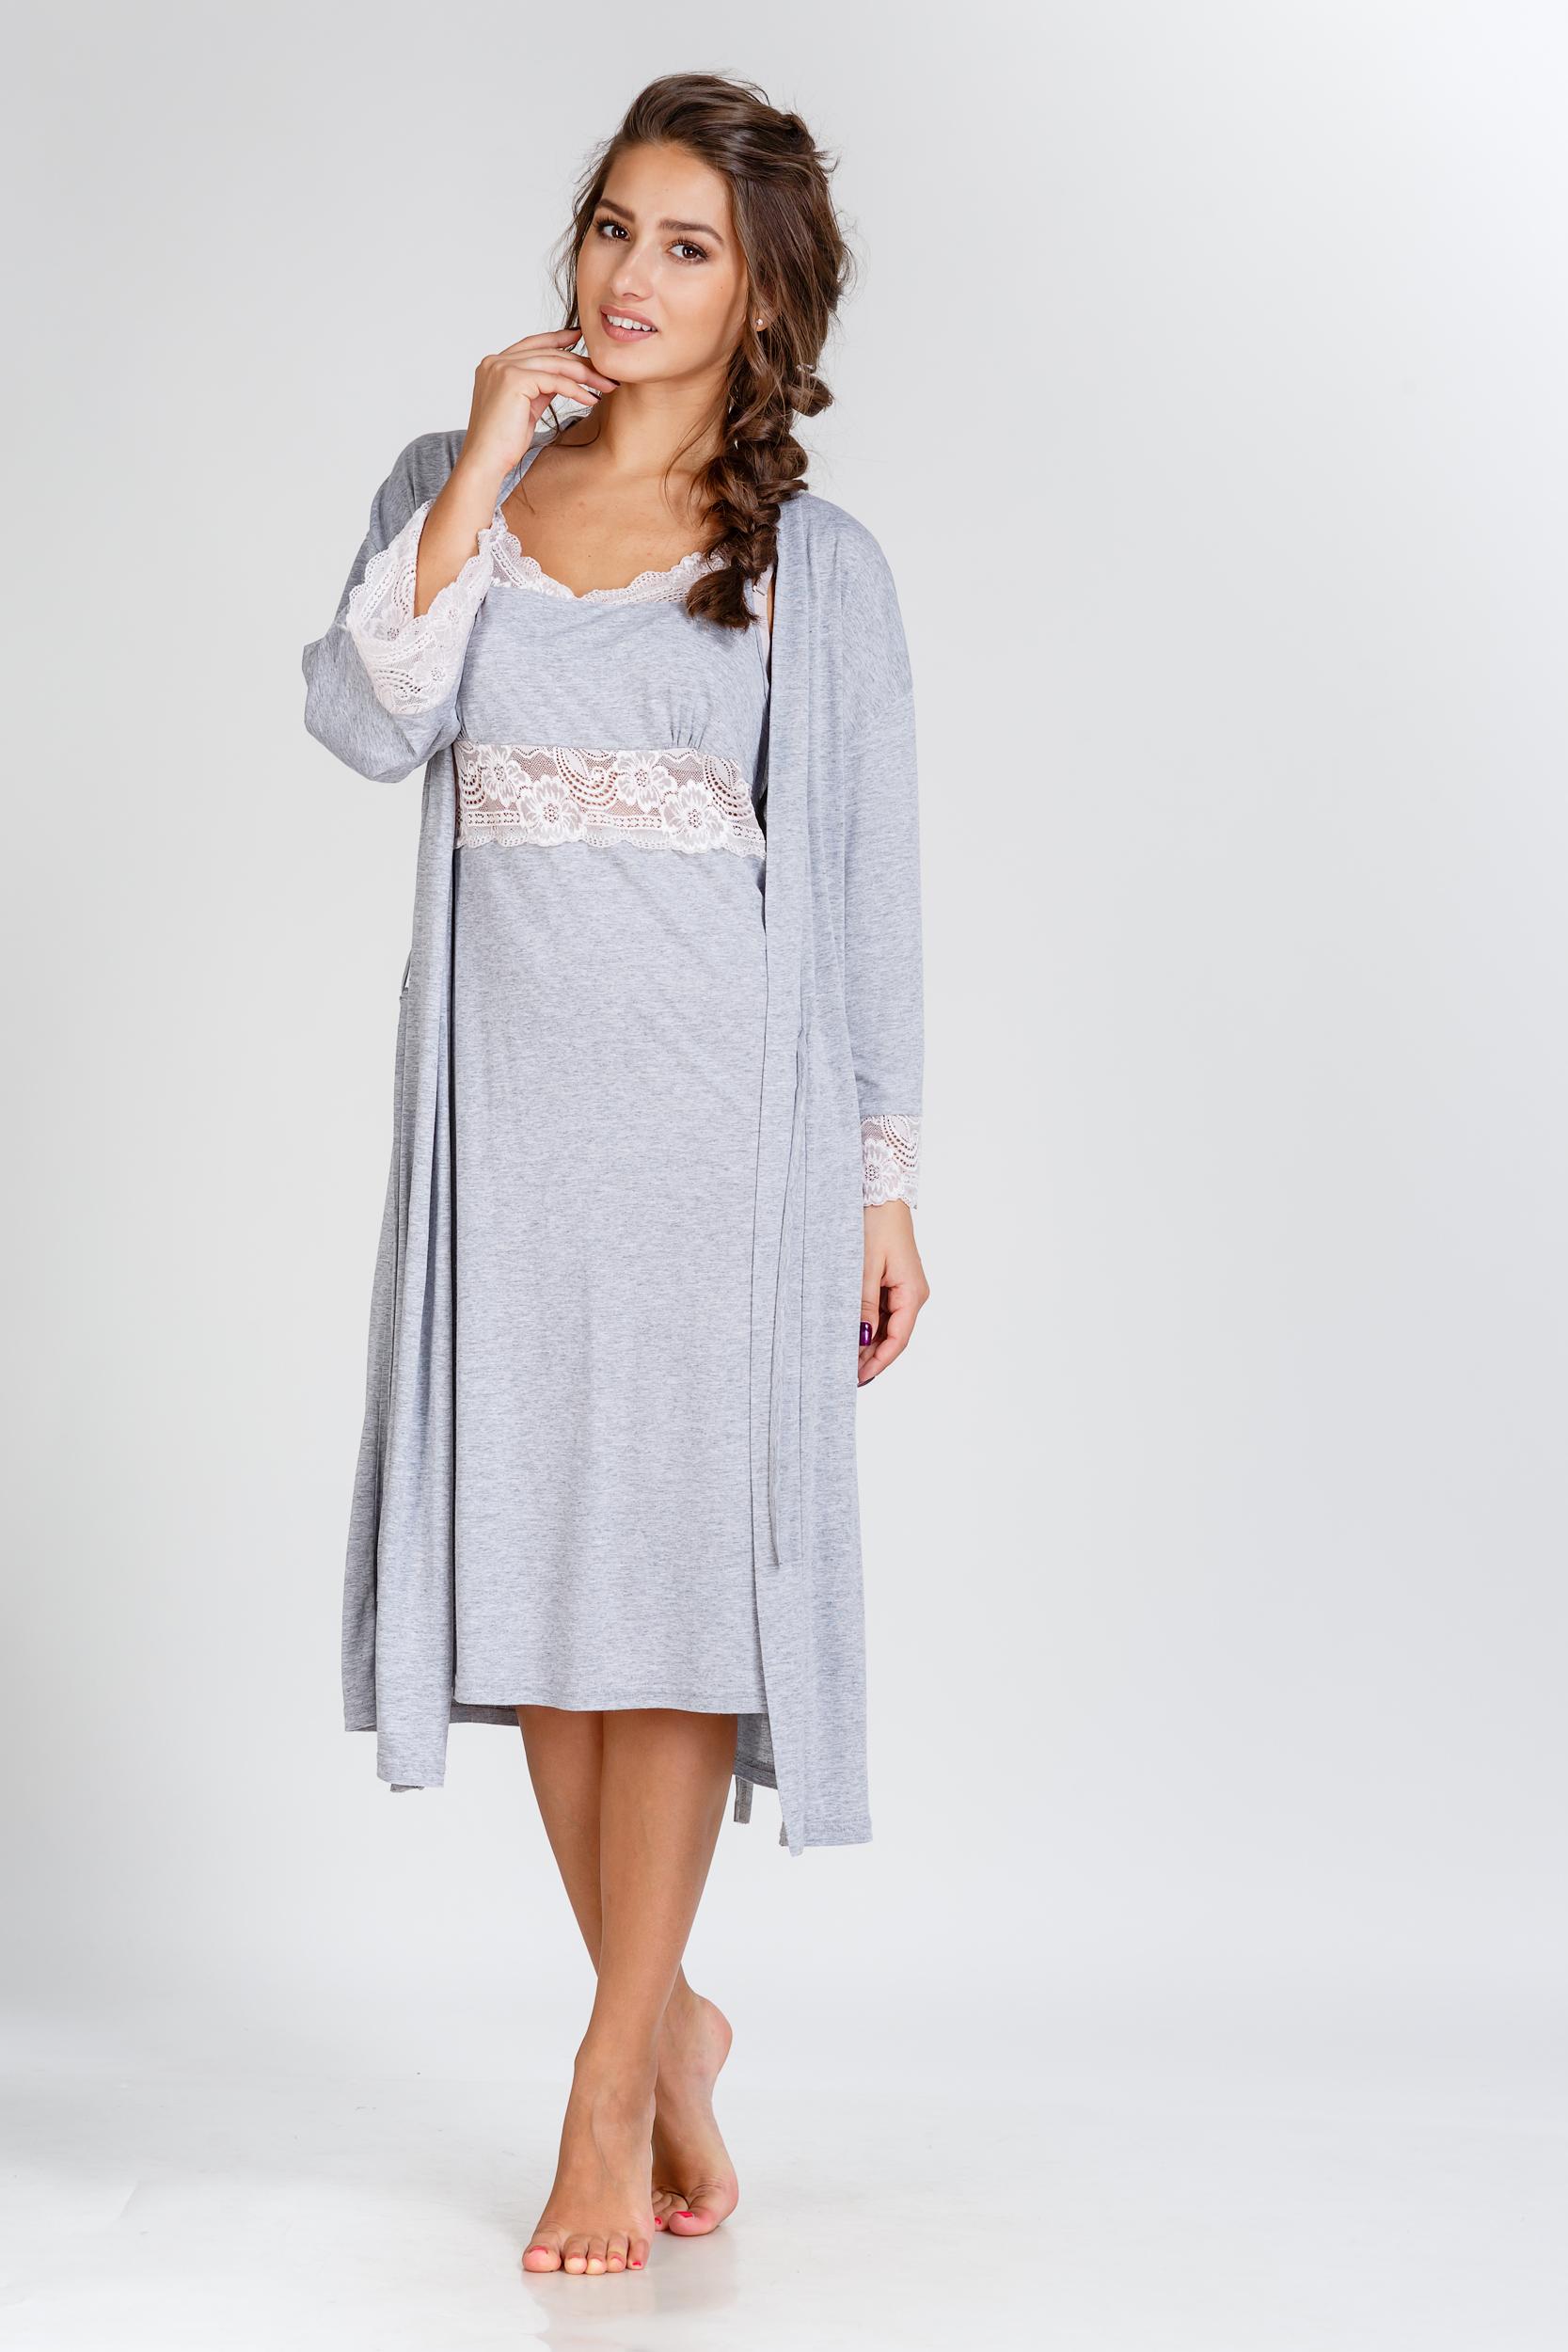 Домашние халаты Pastilla Домашний халат Ласса 2 Цвет: Серый Меланж (M) халаты домашние лори халат